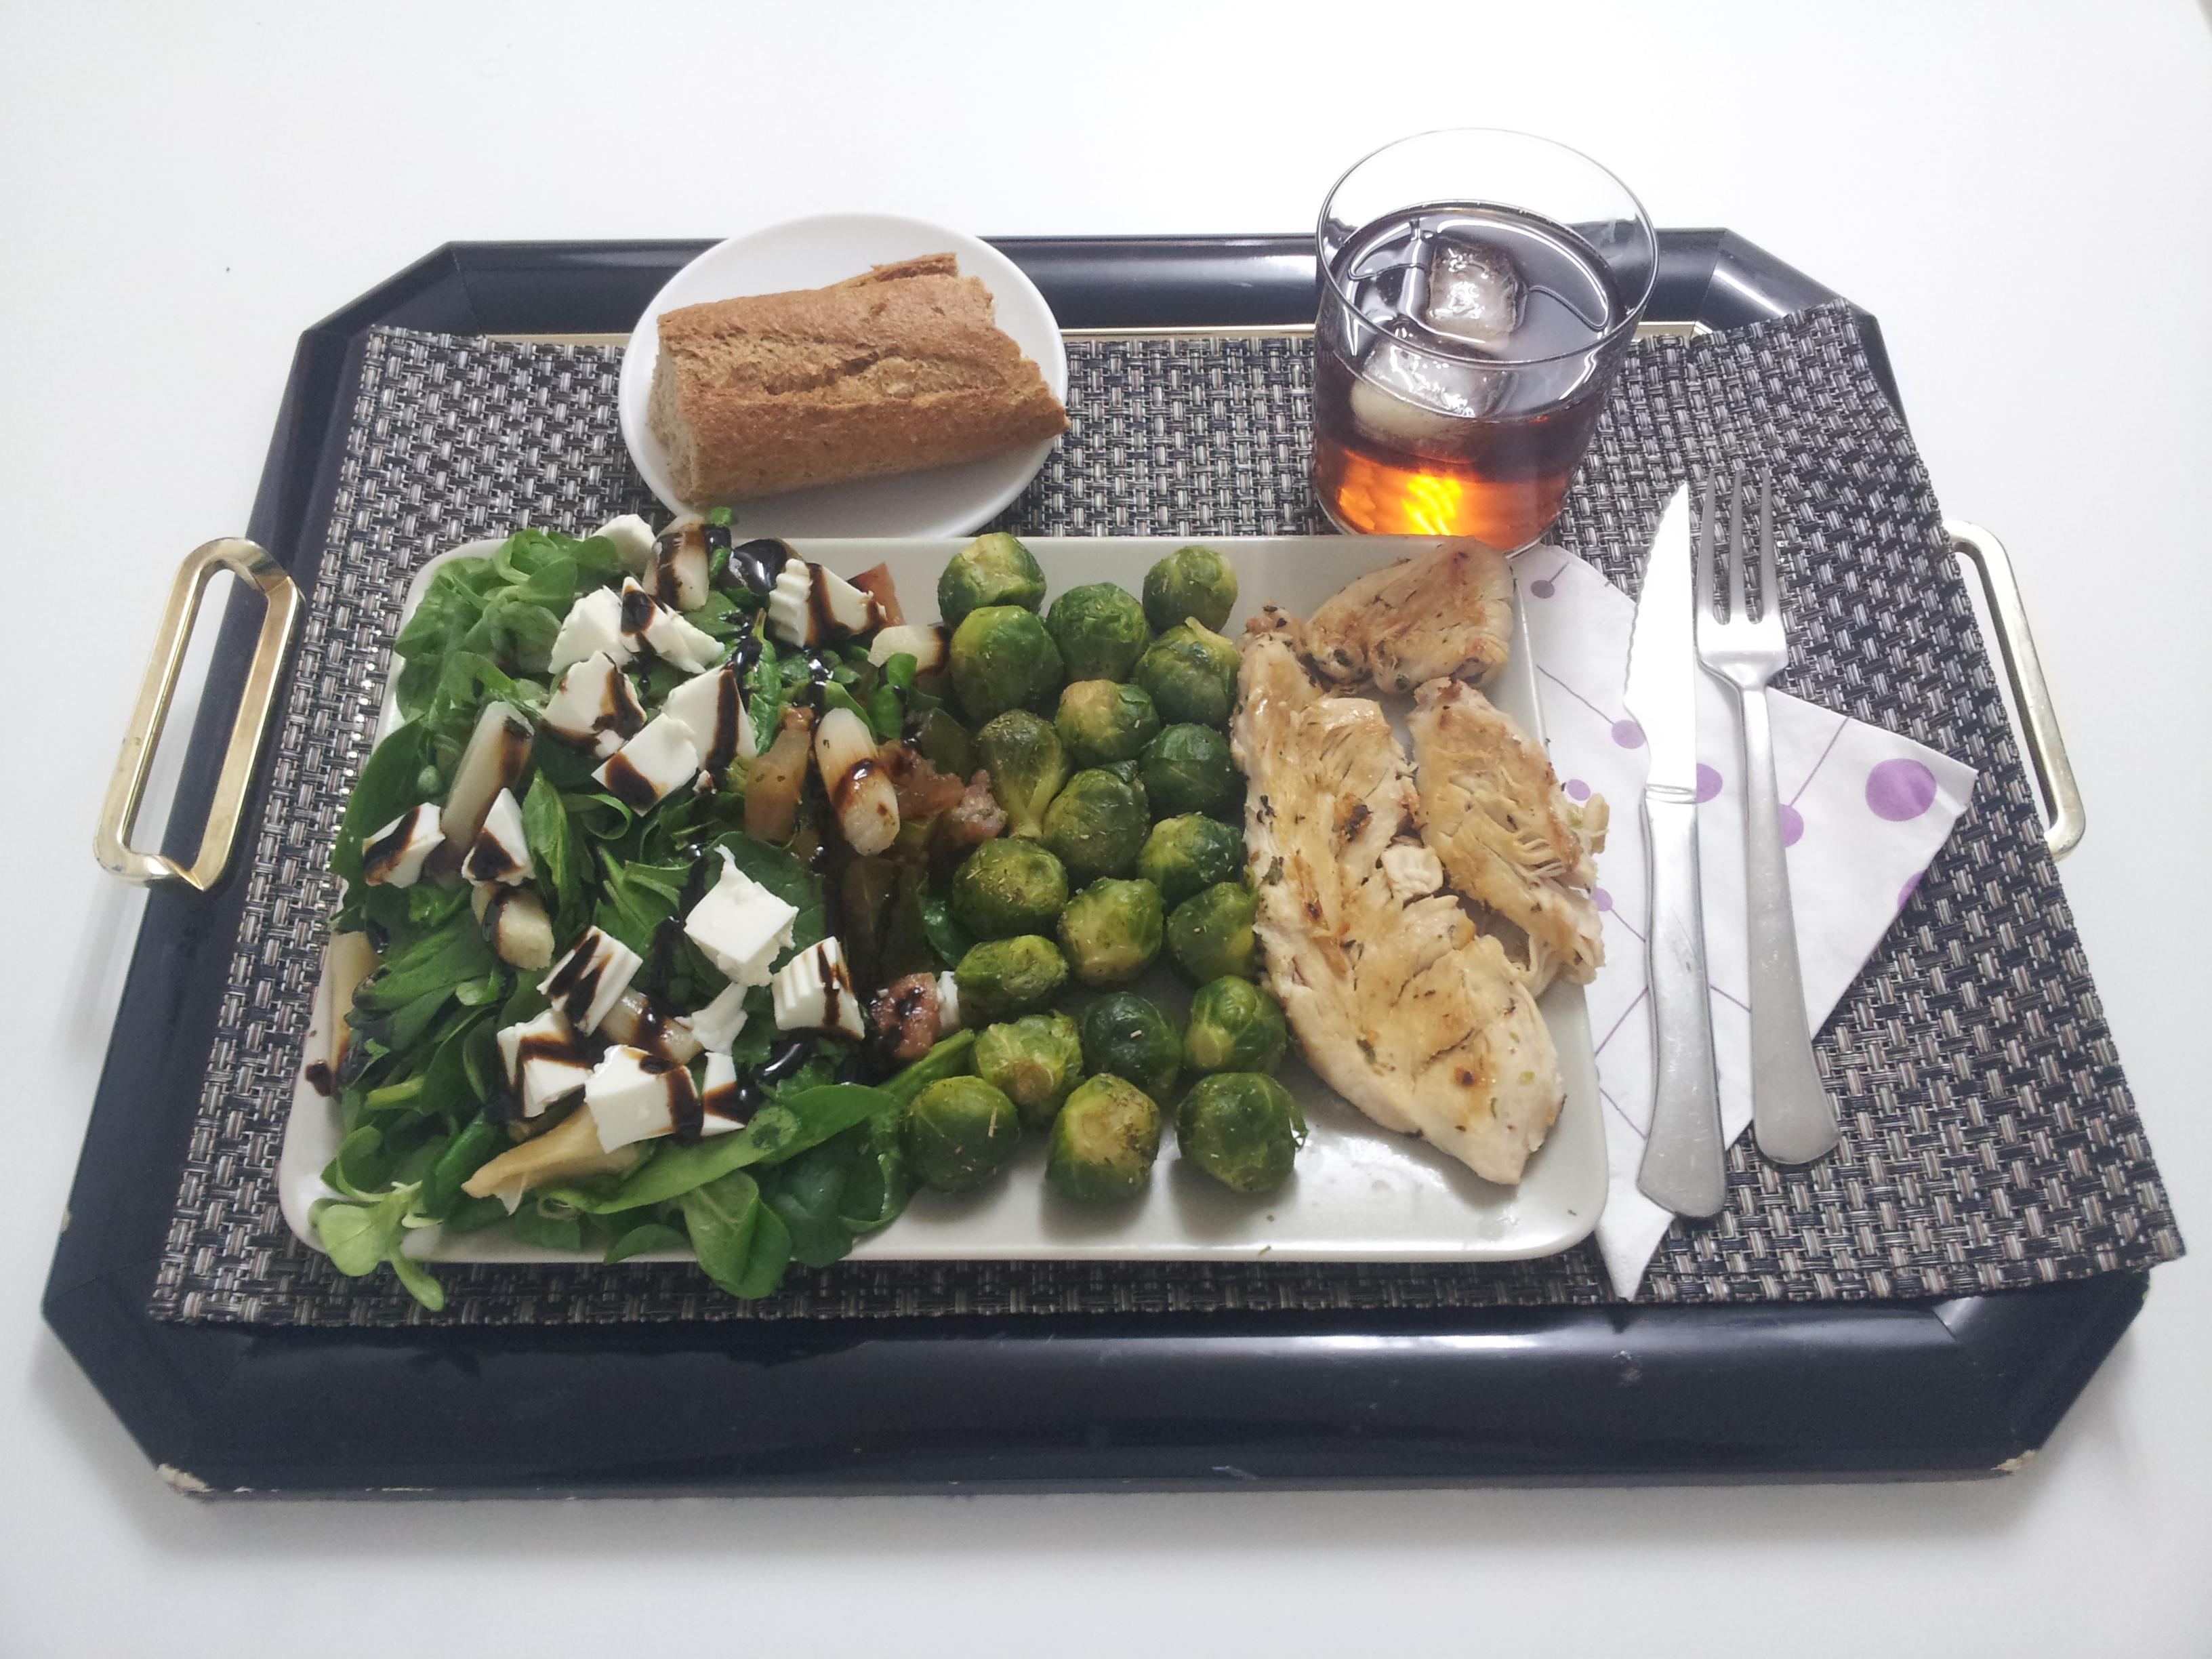 Comida fitness, comida sana, comida saludable, recetas saludables.